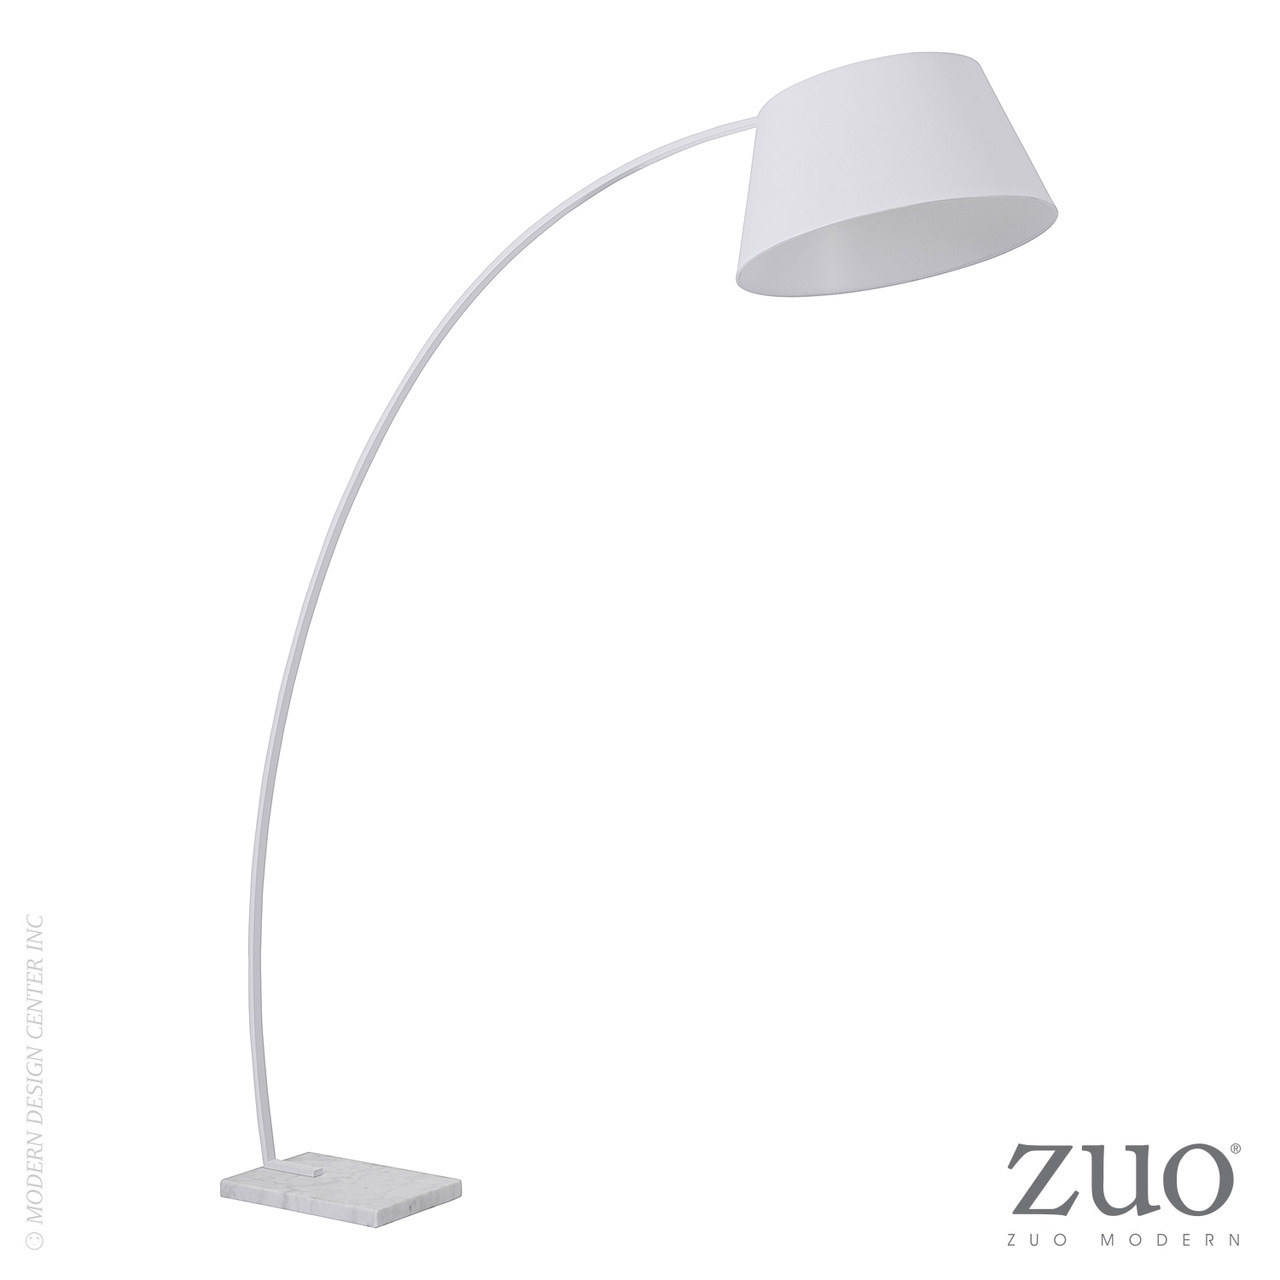 Vortex Floor Lamp White 50192 Zuo Mod Metropolitandecor inside proportions 1280 X 1280